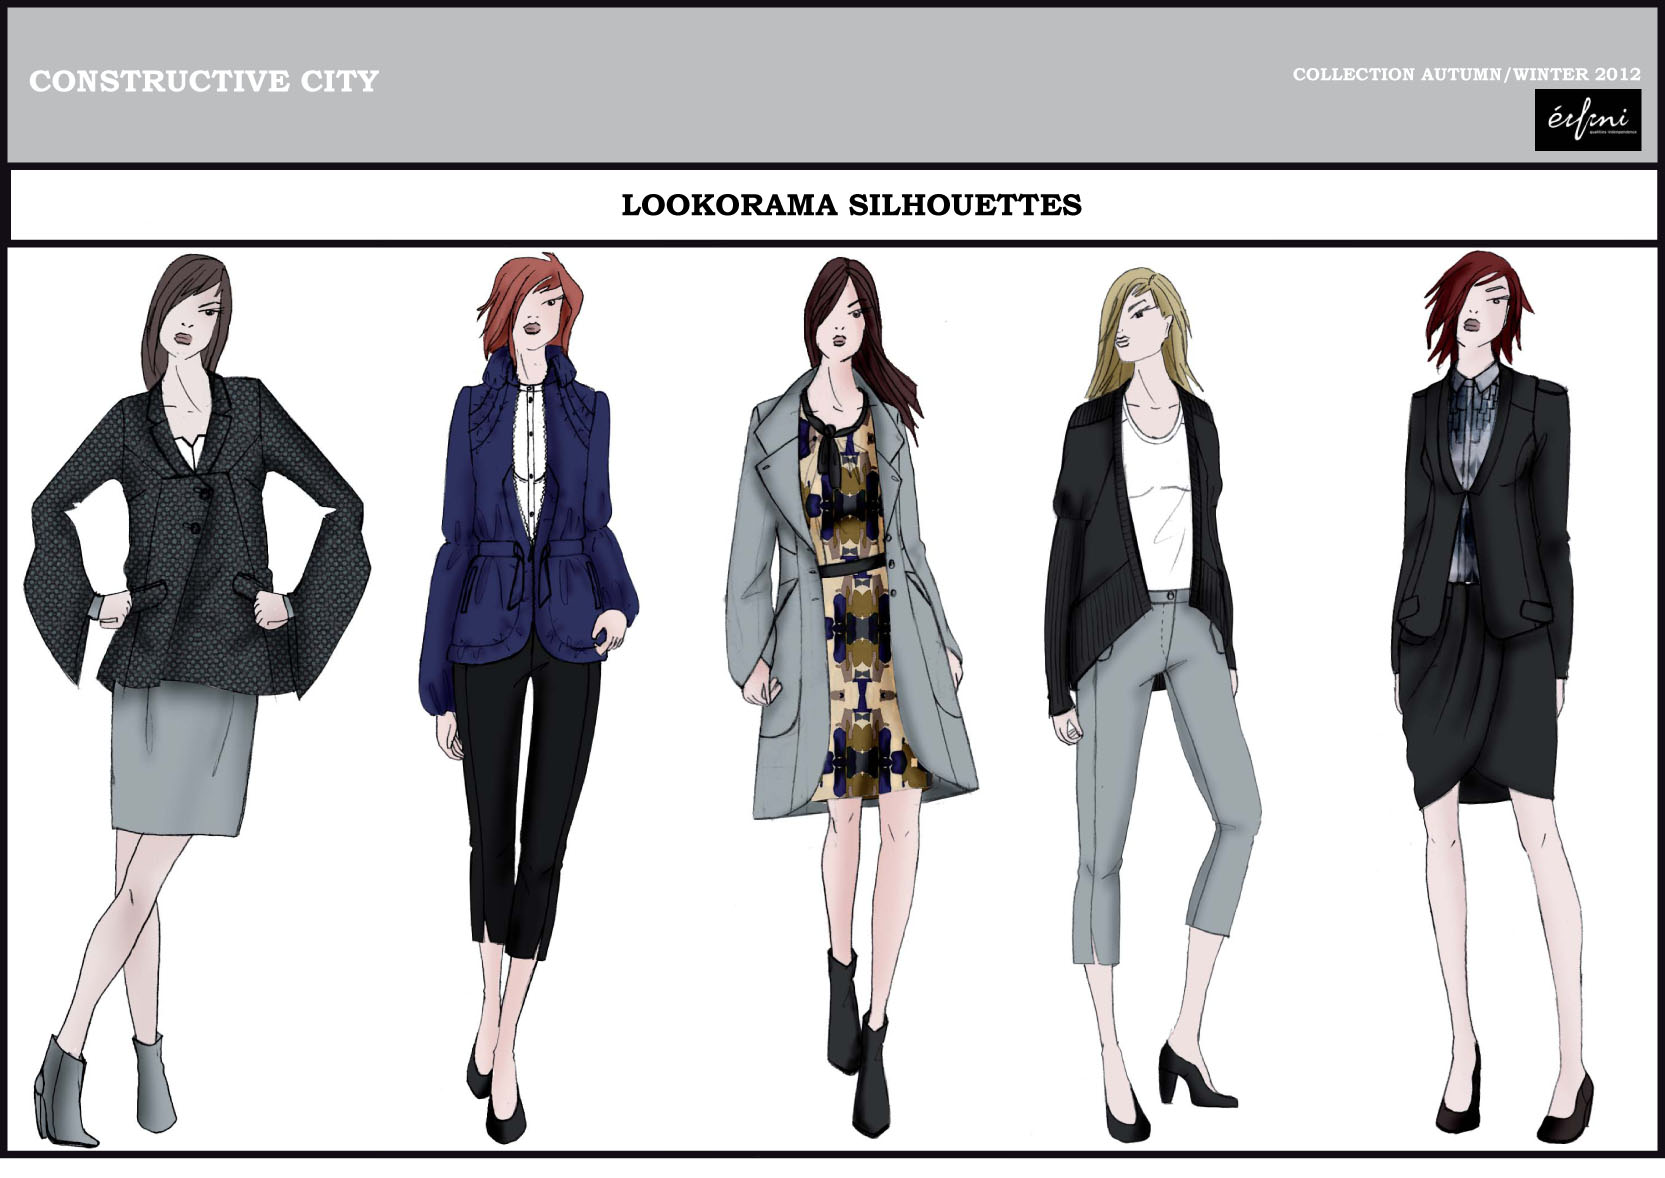 Lookorama constructive city silhouettes.ai